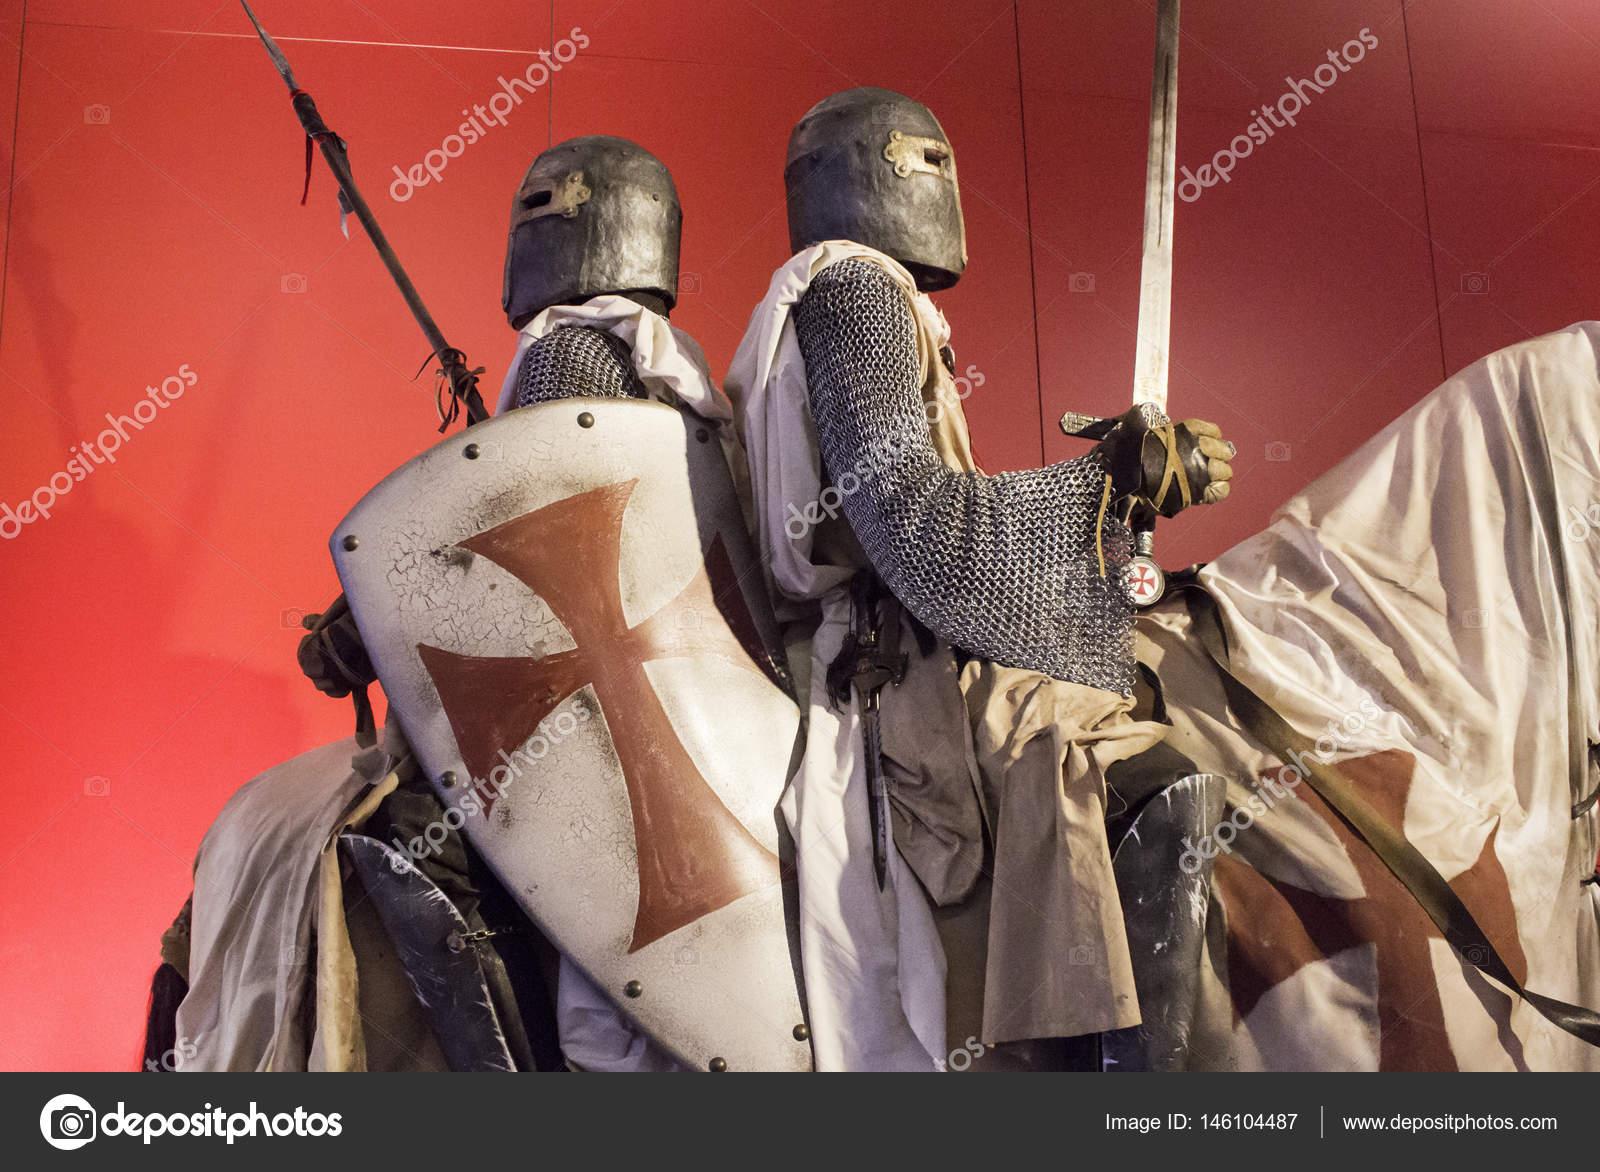 Pictures: templar armor | Knights Templar armor — Stock